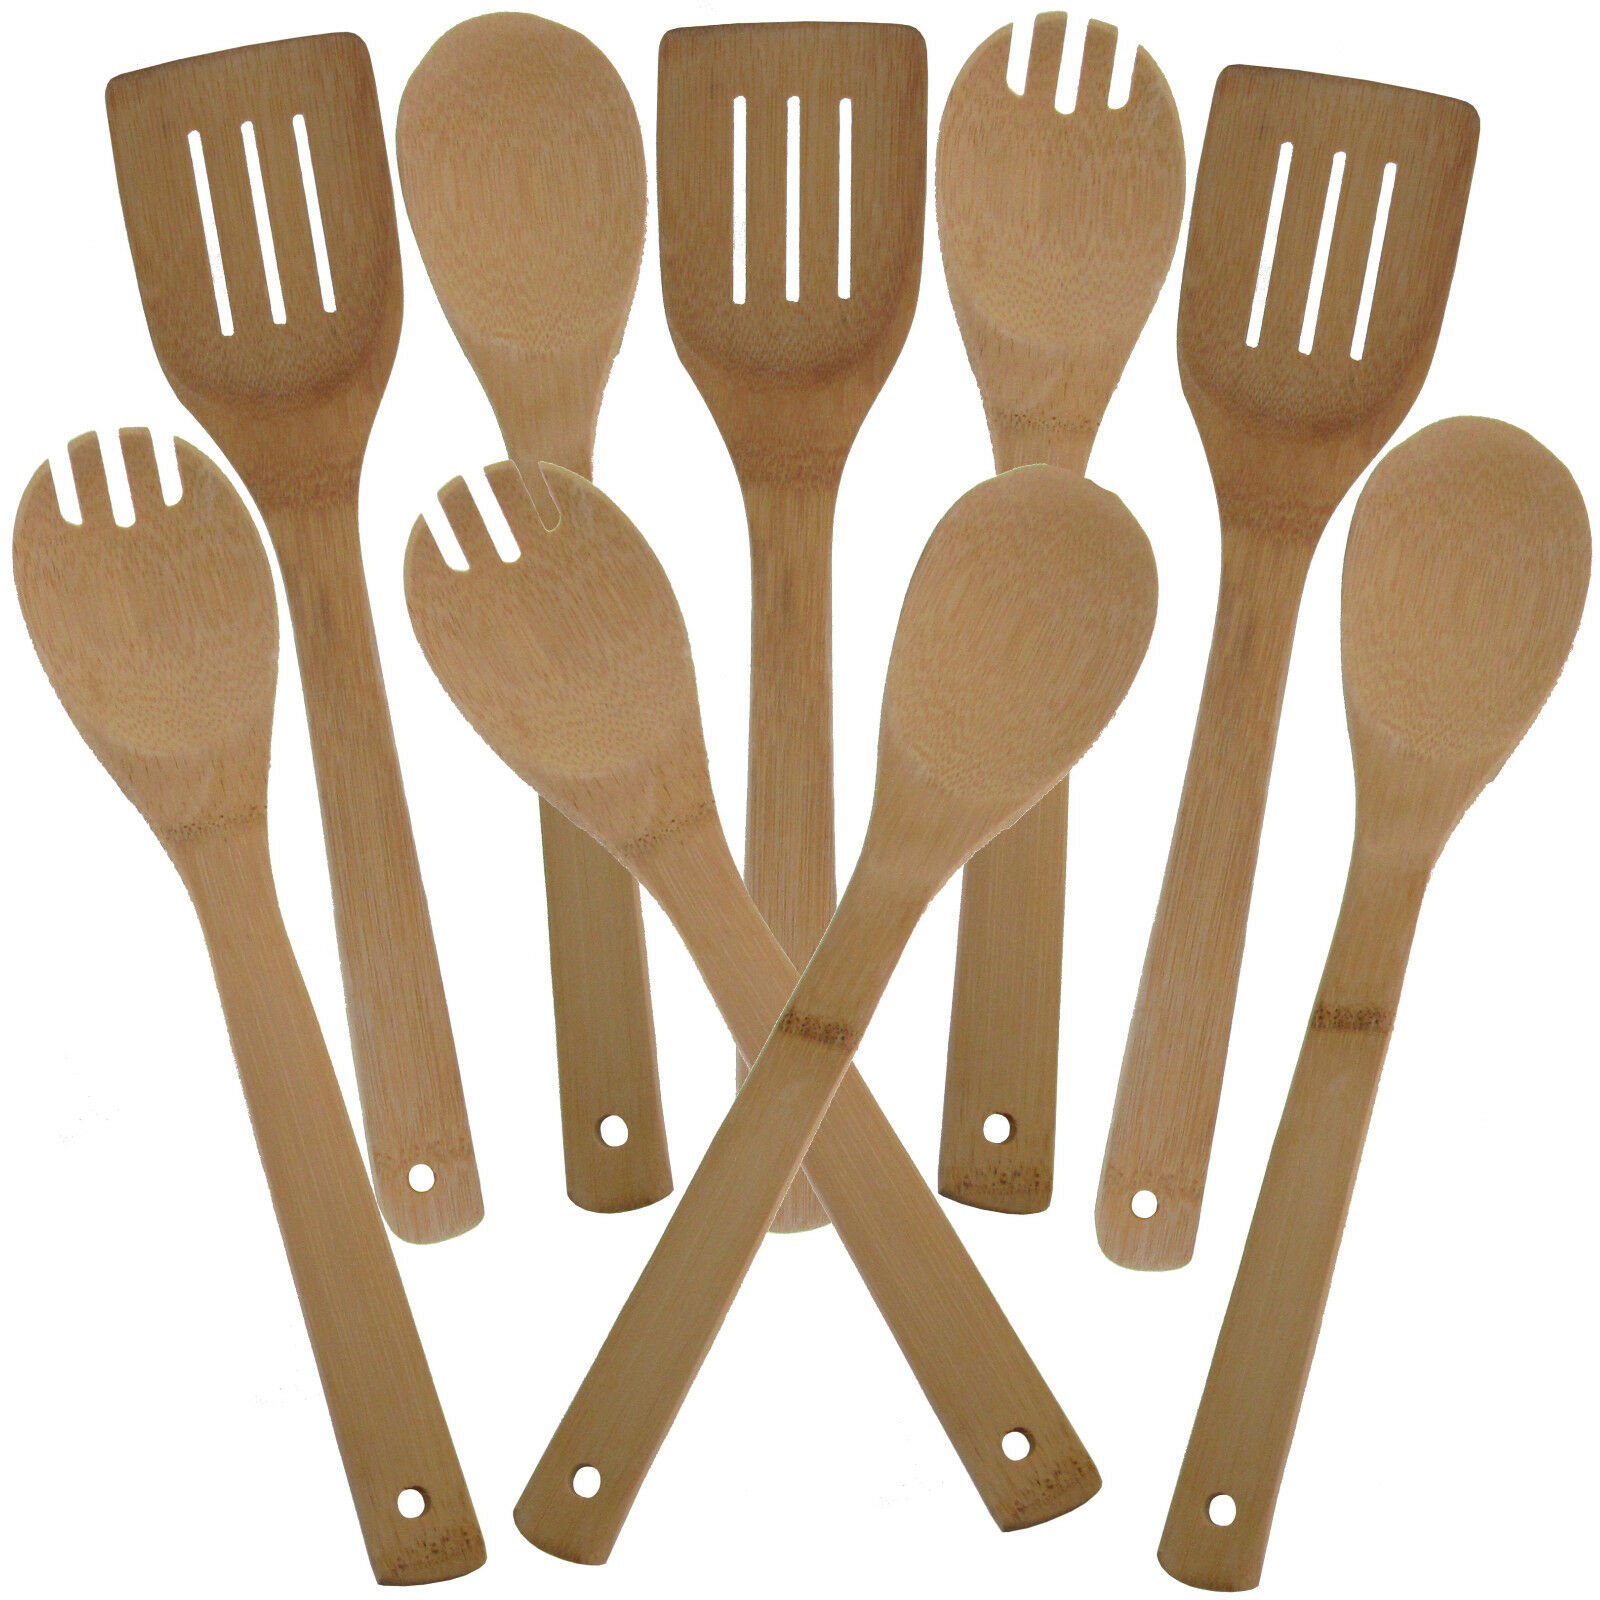 Bambusbesteck 9-Tlg Küchenutensilien Küchenuntensilienhalter Bambus Besteck